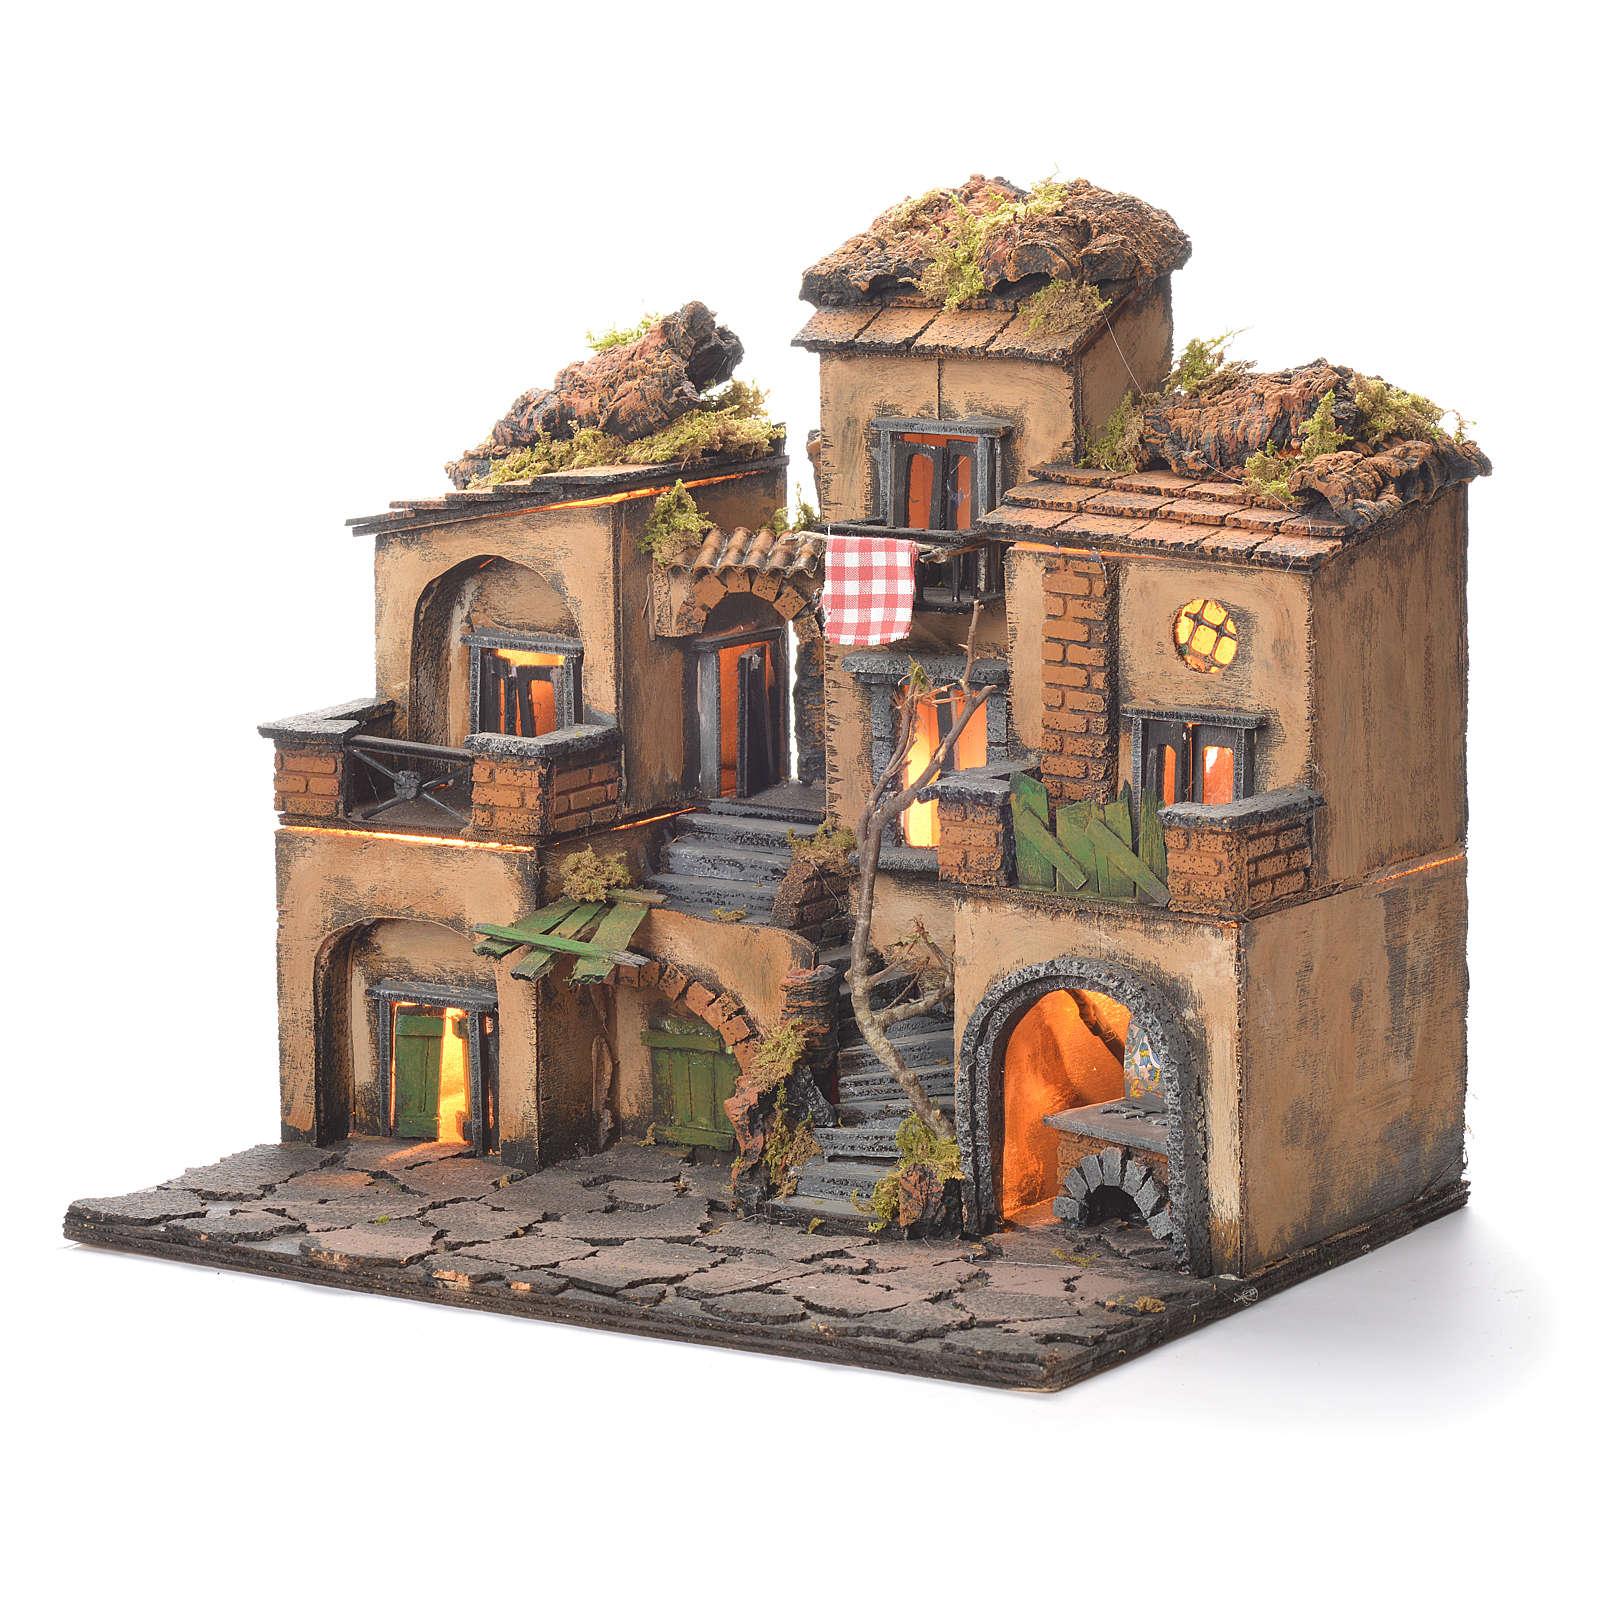 Borgo presepe stile 700 napoletano 45x35x33 4